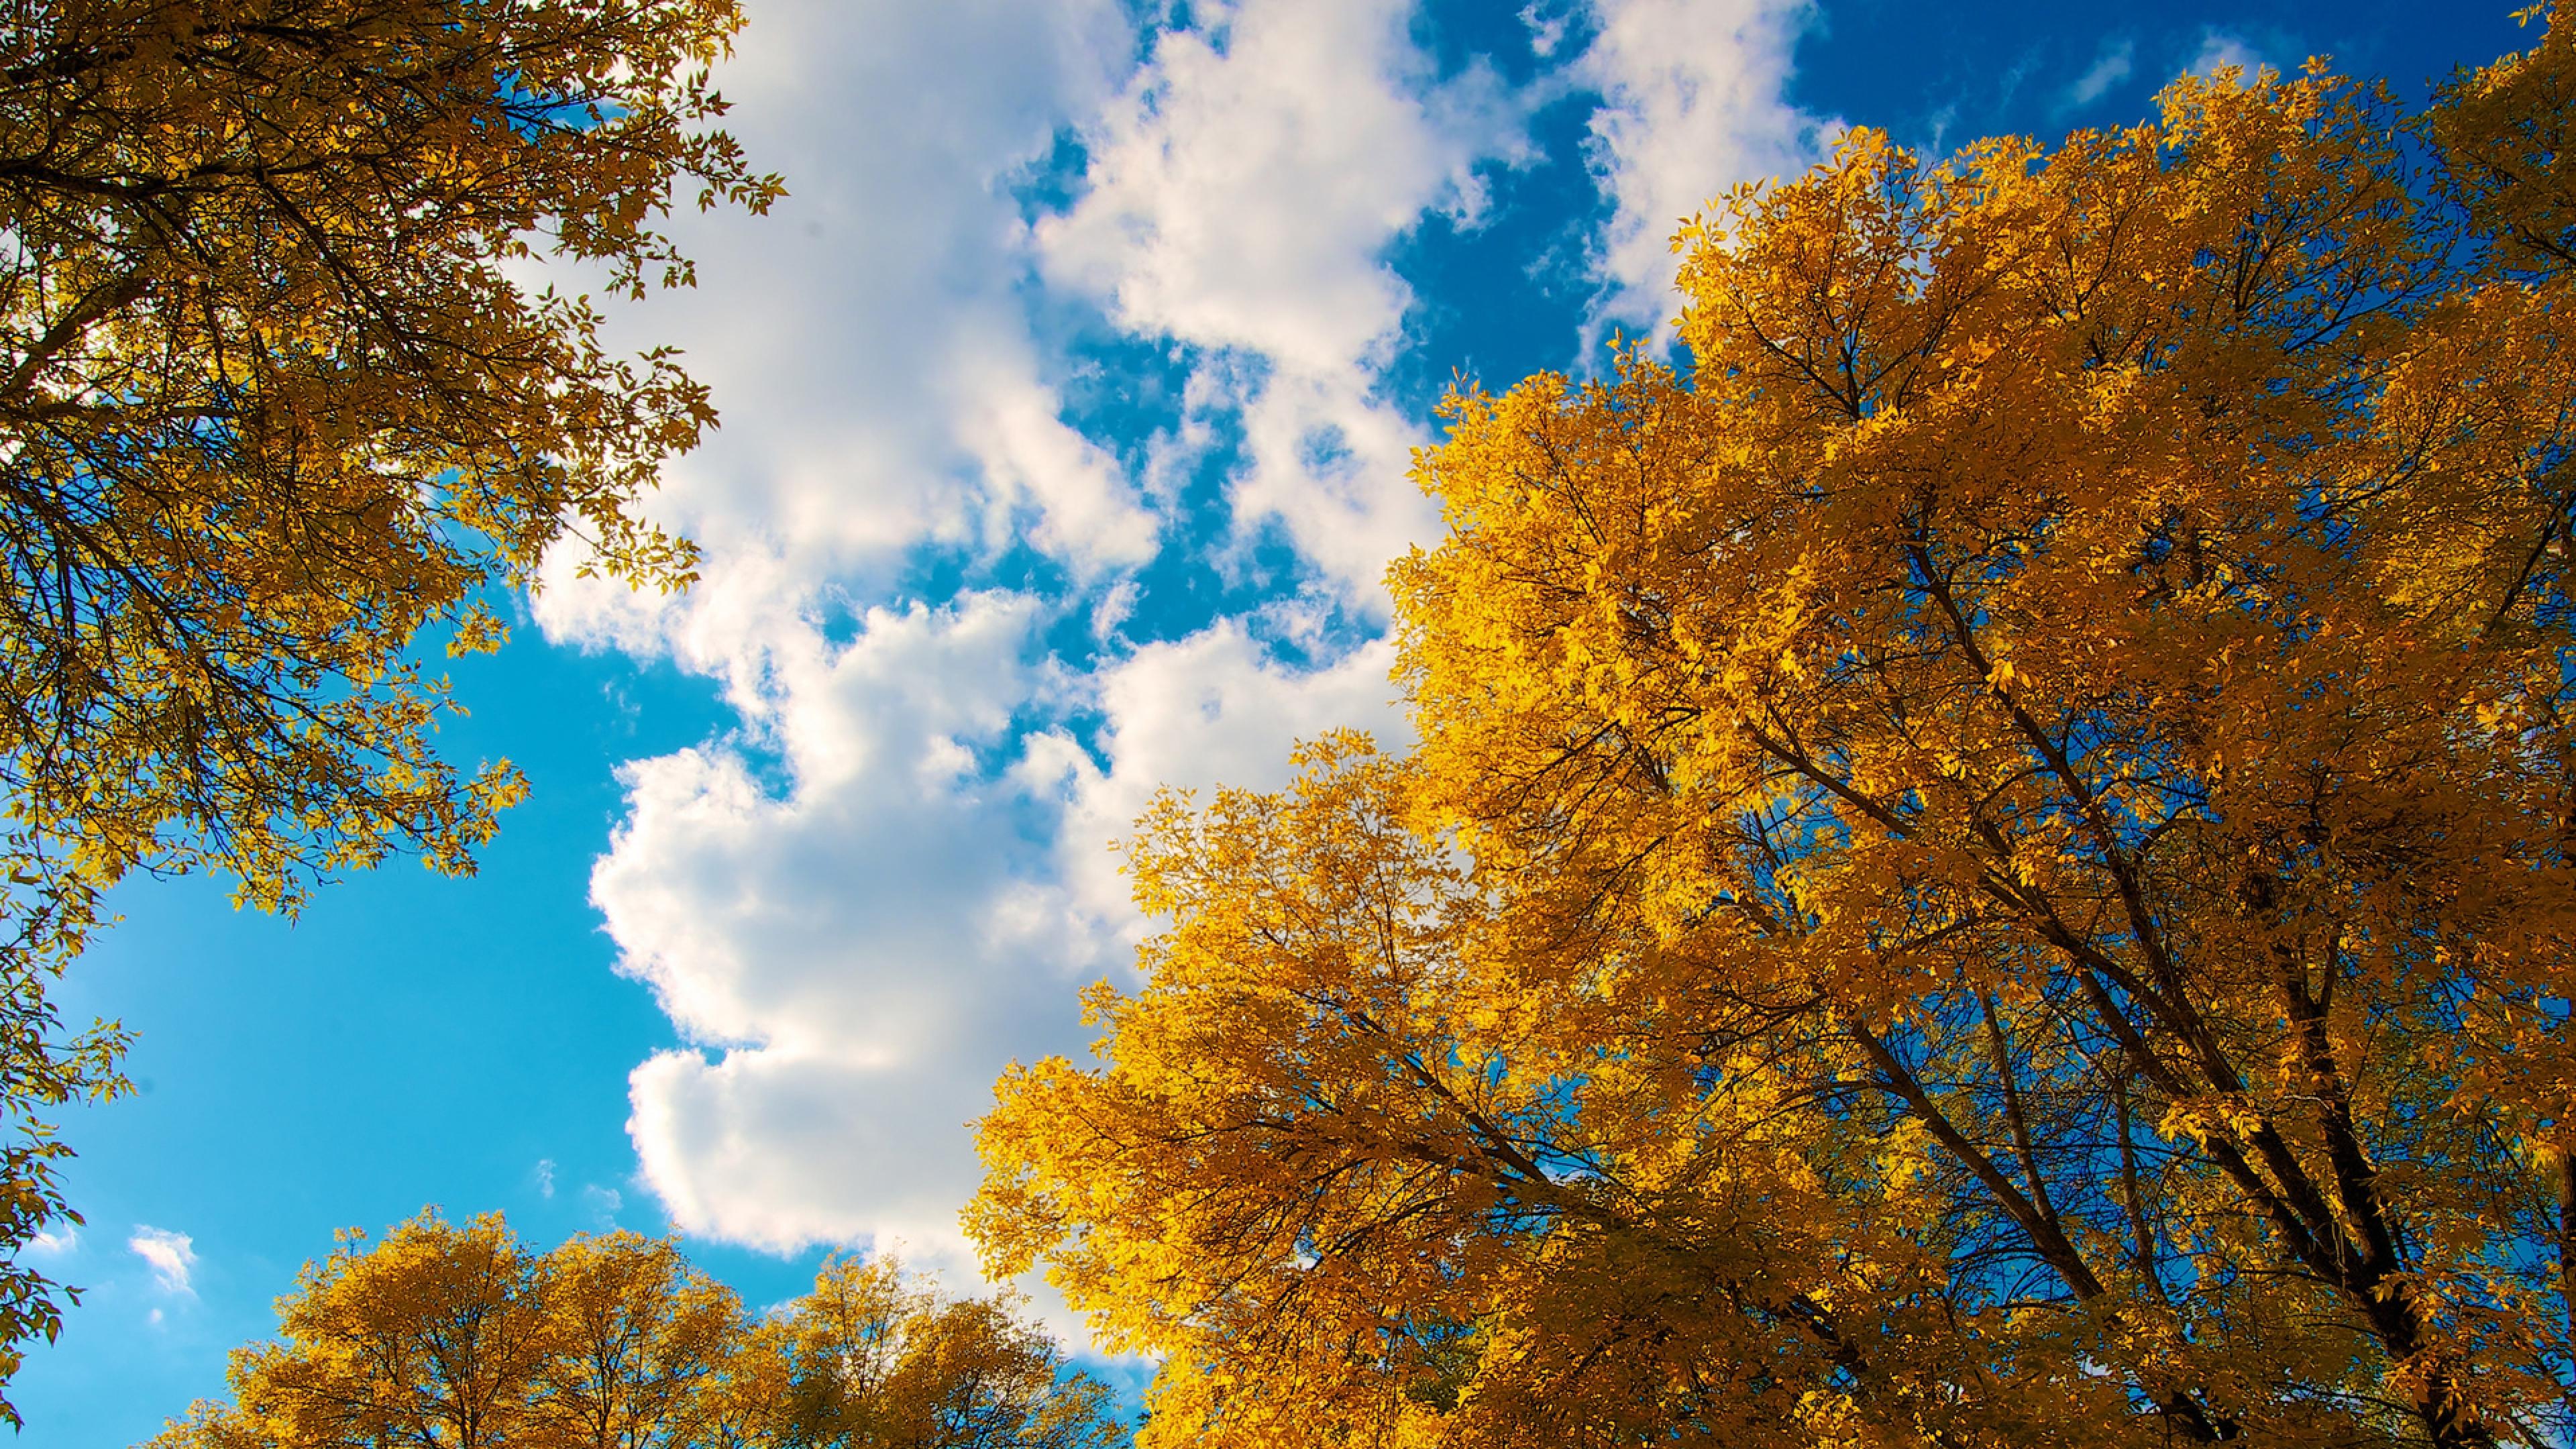 trees autumn clouds 4k 1540131087 - Trees Autumn Clouds 4k - trees wallpapers, nature wallpapers, clouds wallpapers, autumn wallpapers